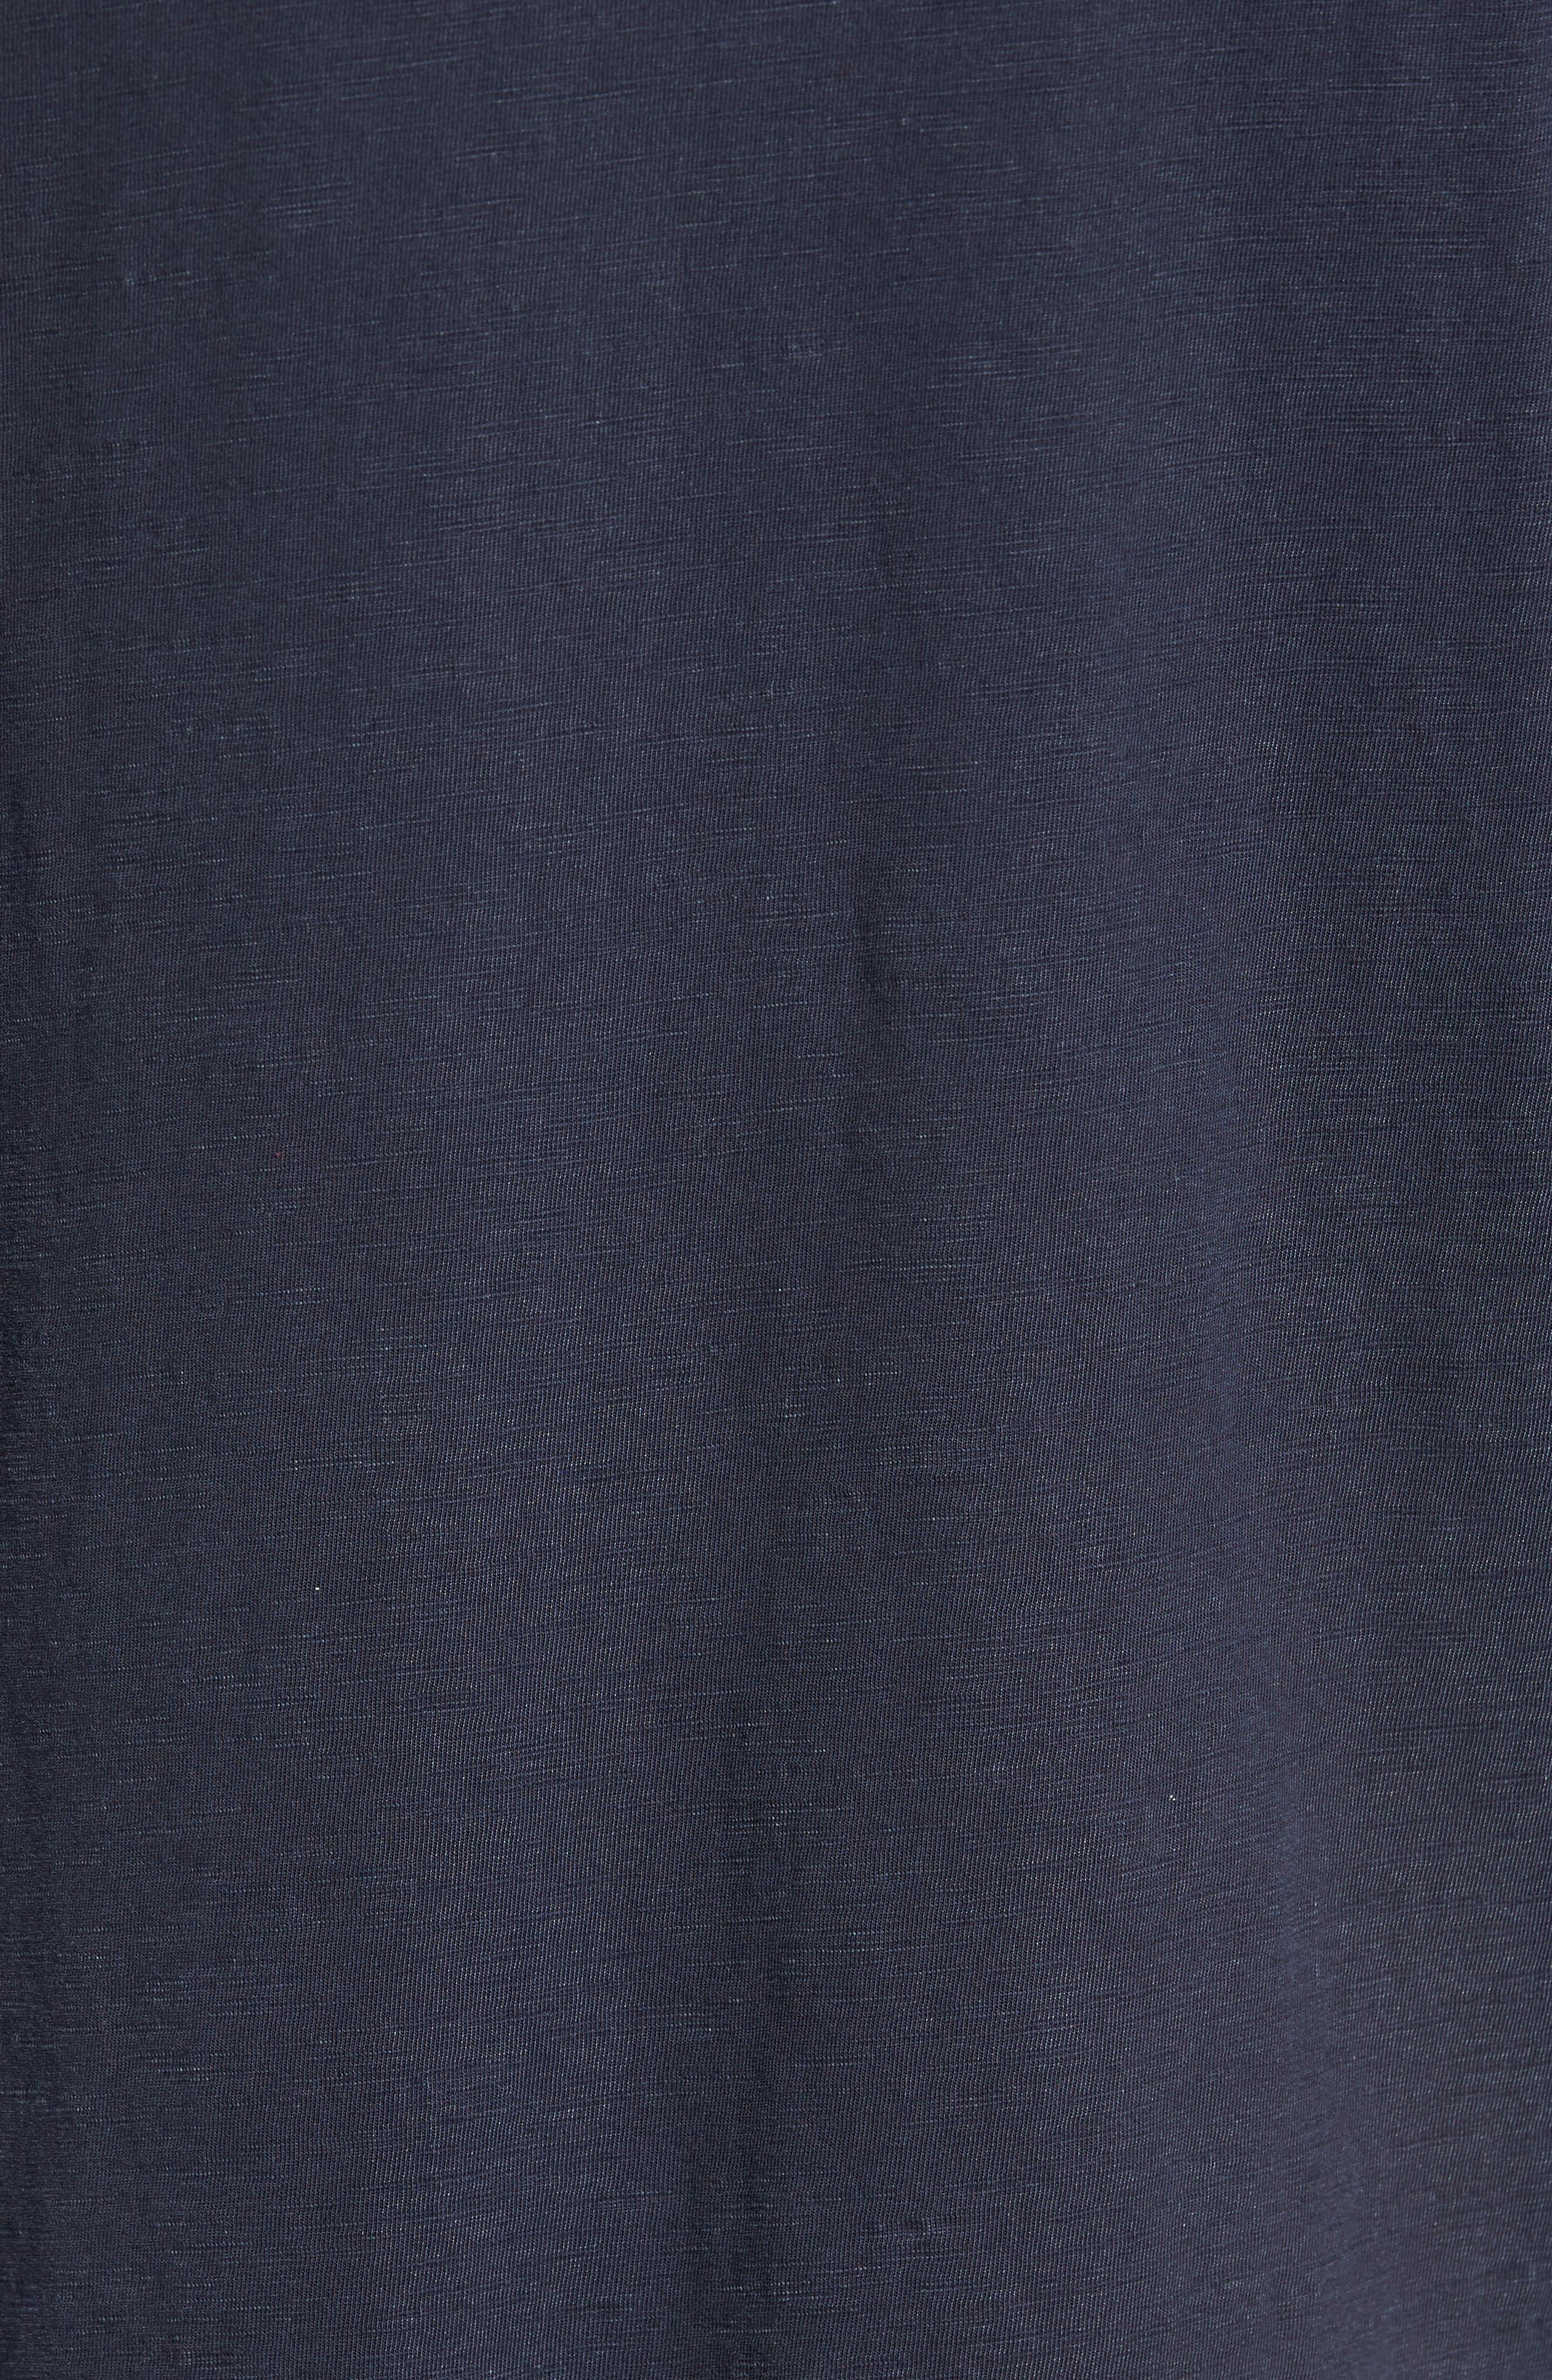 Kantano T-Shirt,                             Alternate thumbnail 5, color,                             400